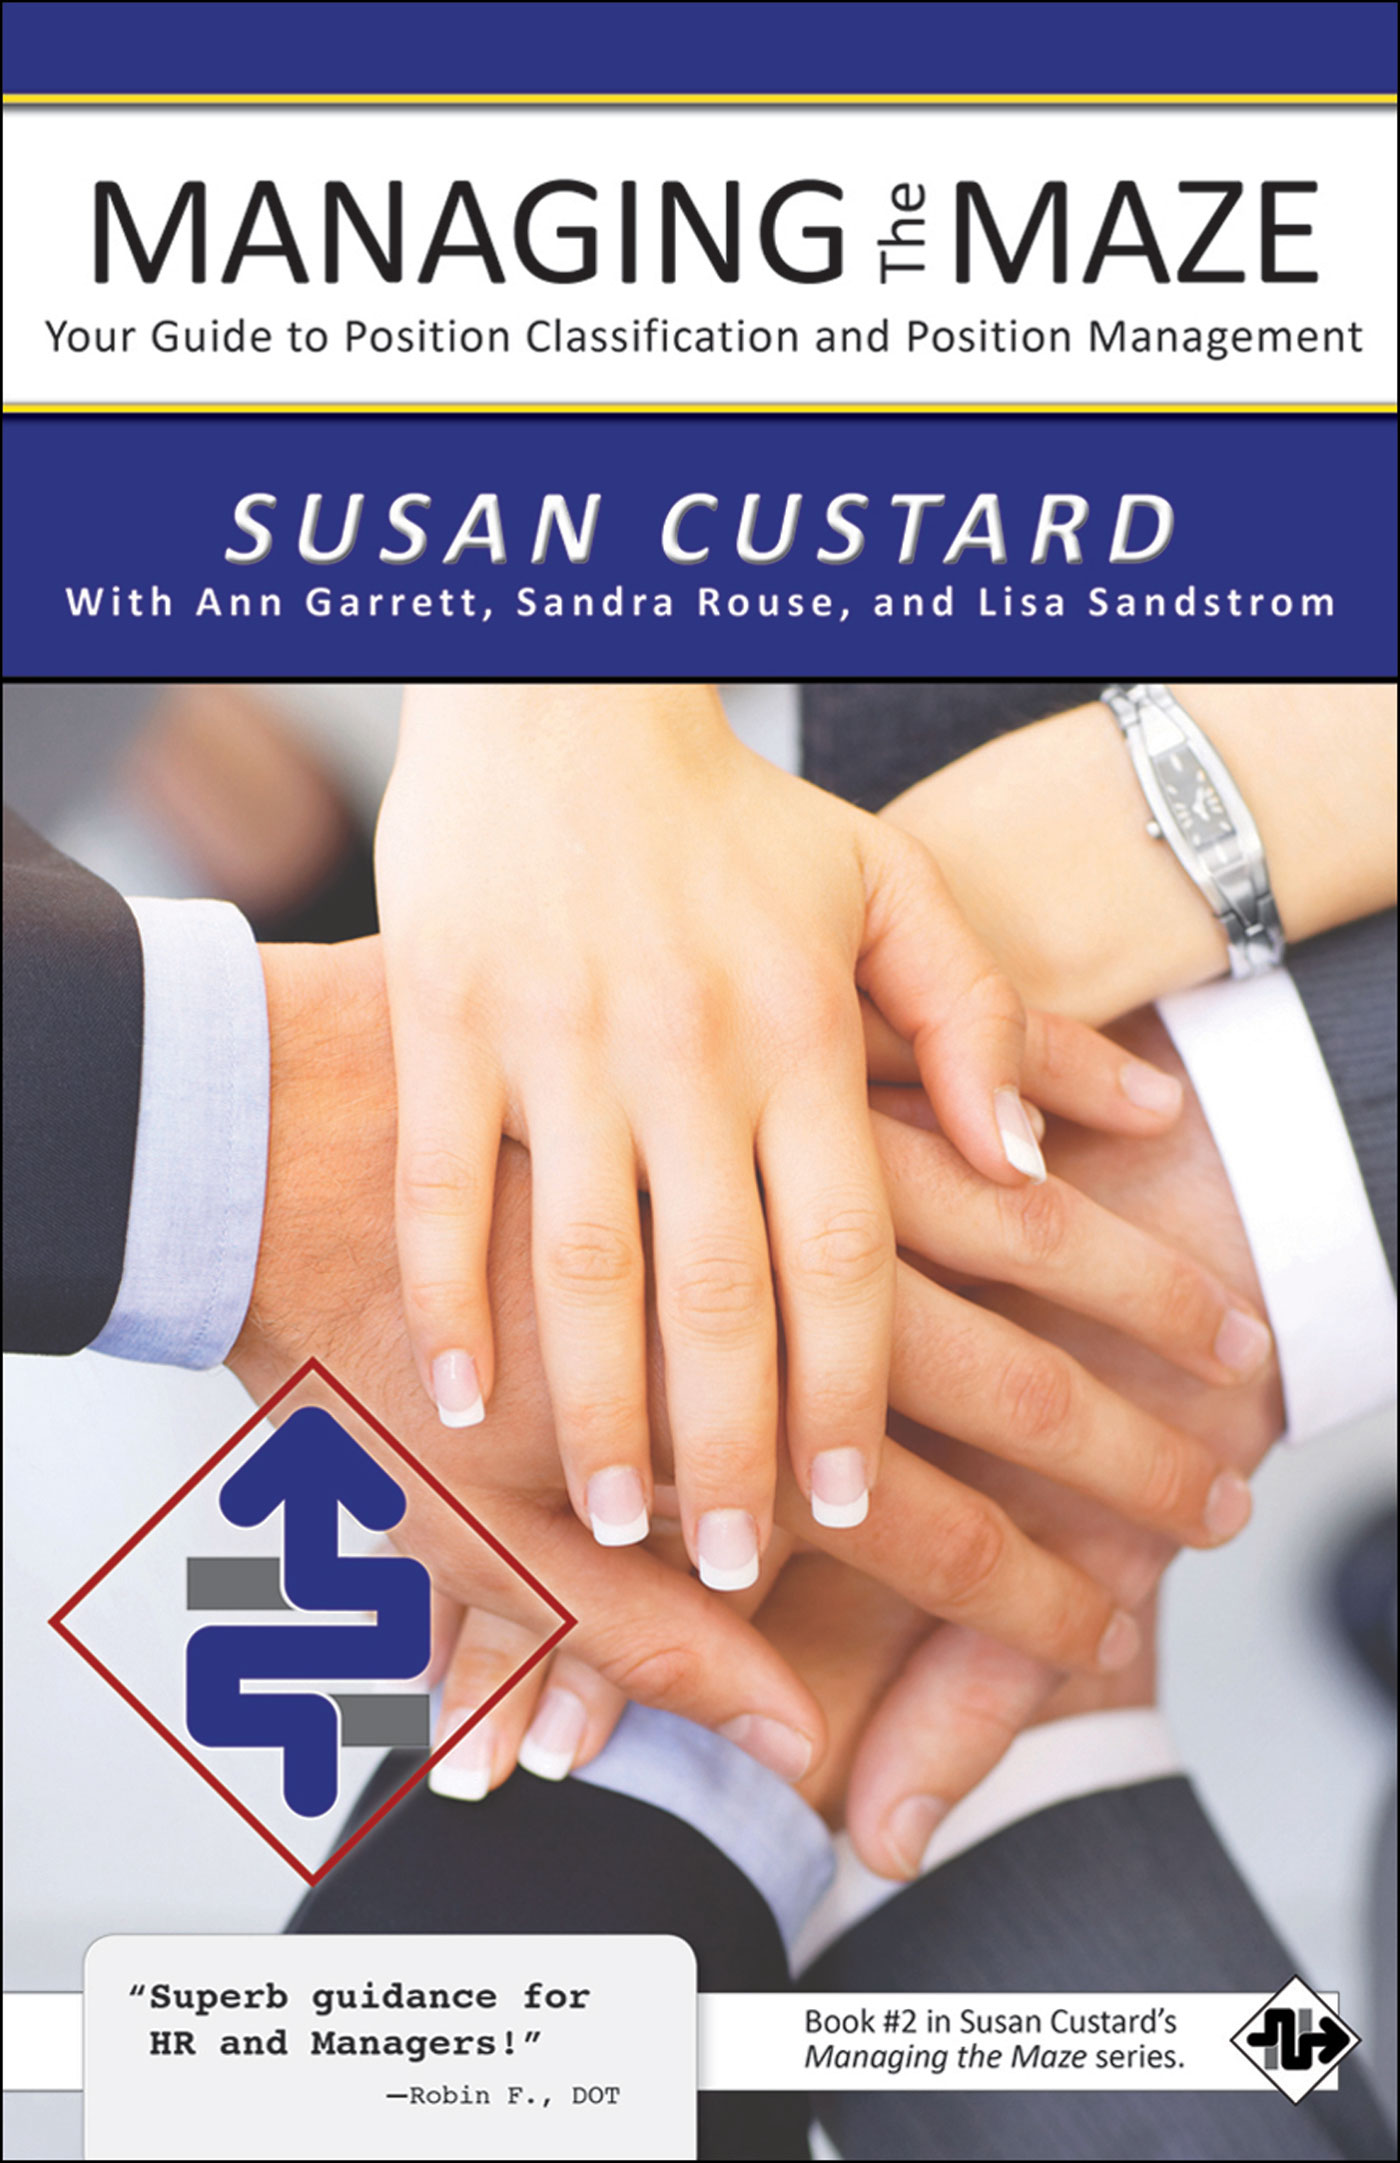 guide, management, position, classification, susan, custard, susan custard